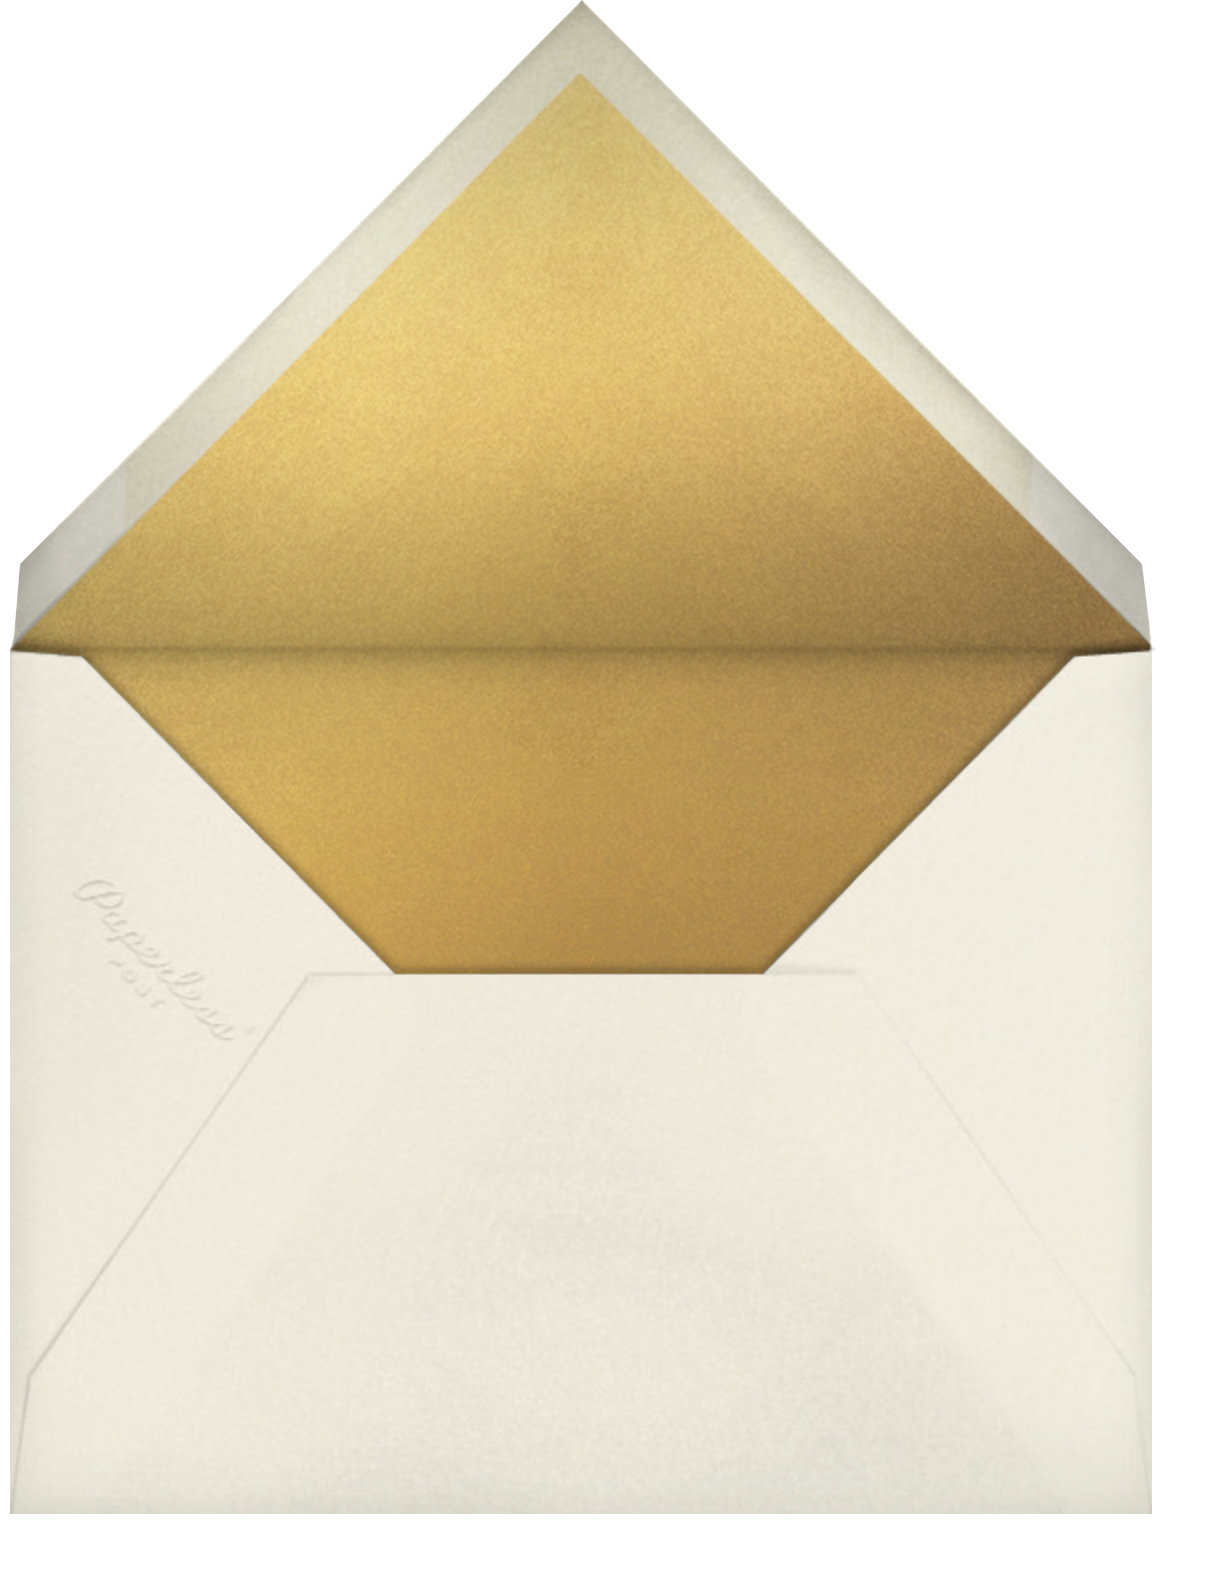 Big Things - Paperless Post - Graduation cards - envelope back